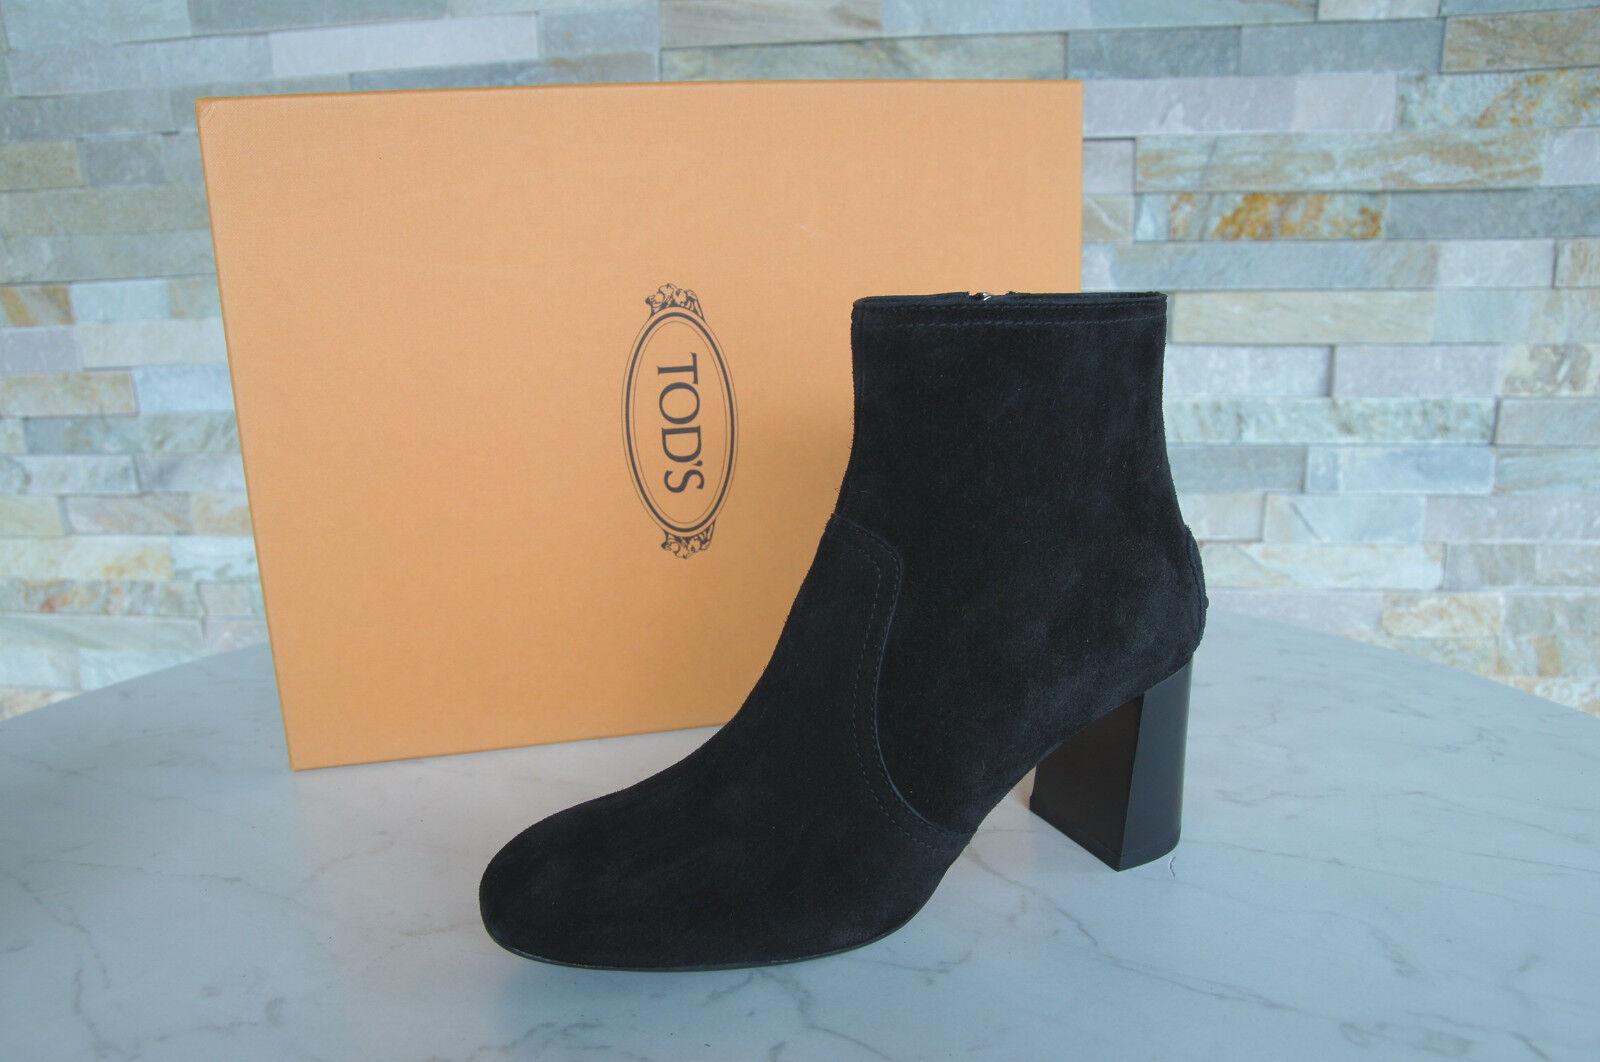 Tods Tods Tods Tod's botines talla 37 botaies botas zapatos negro nuevo ex. PVP  Obtén lo ultimo